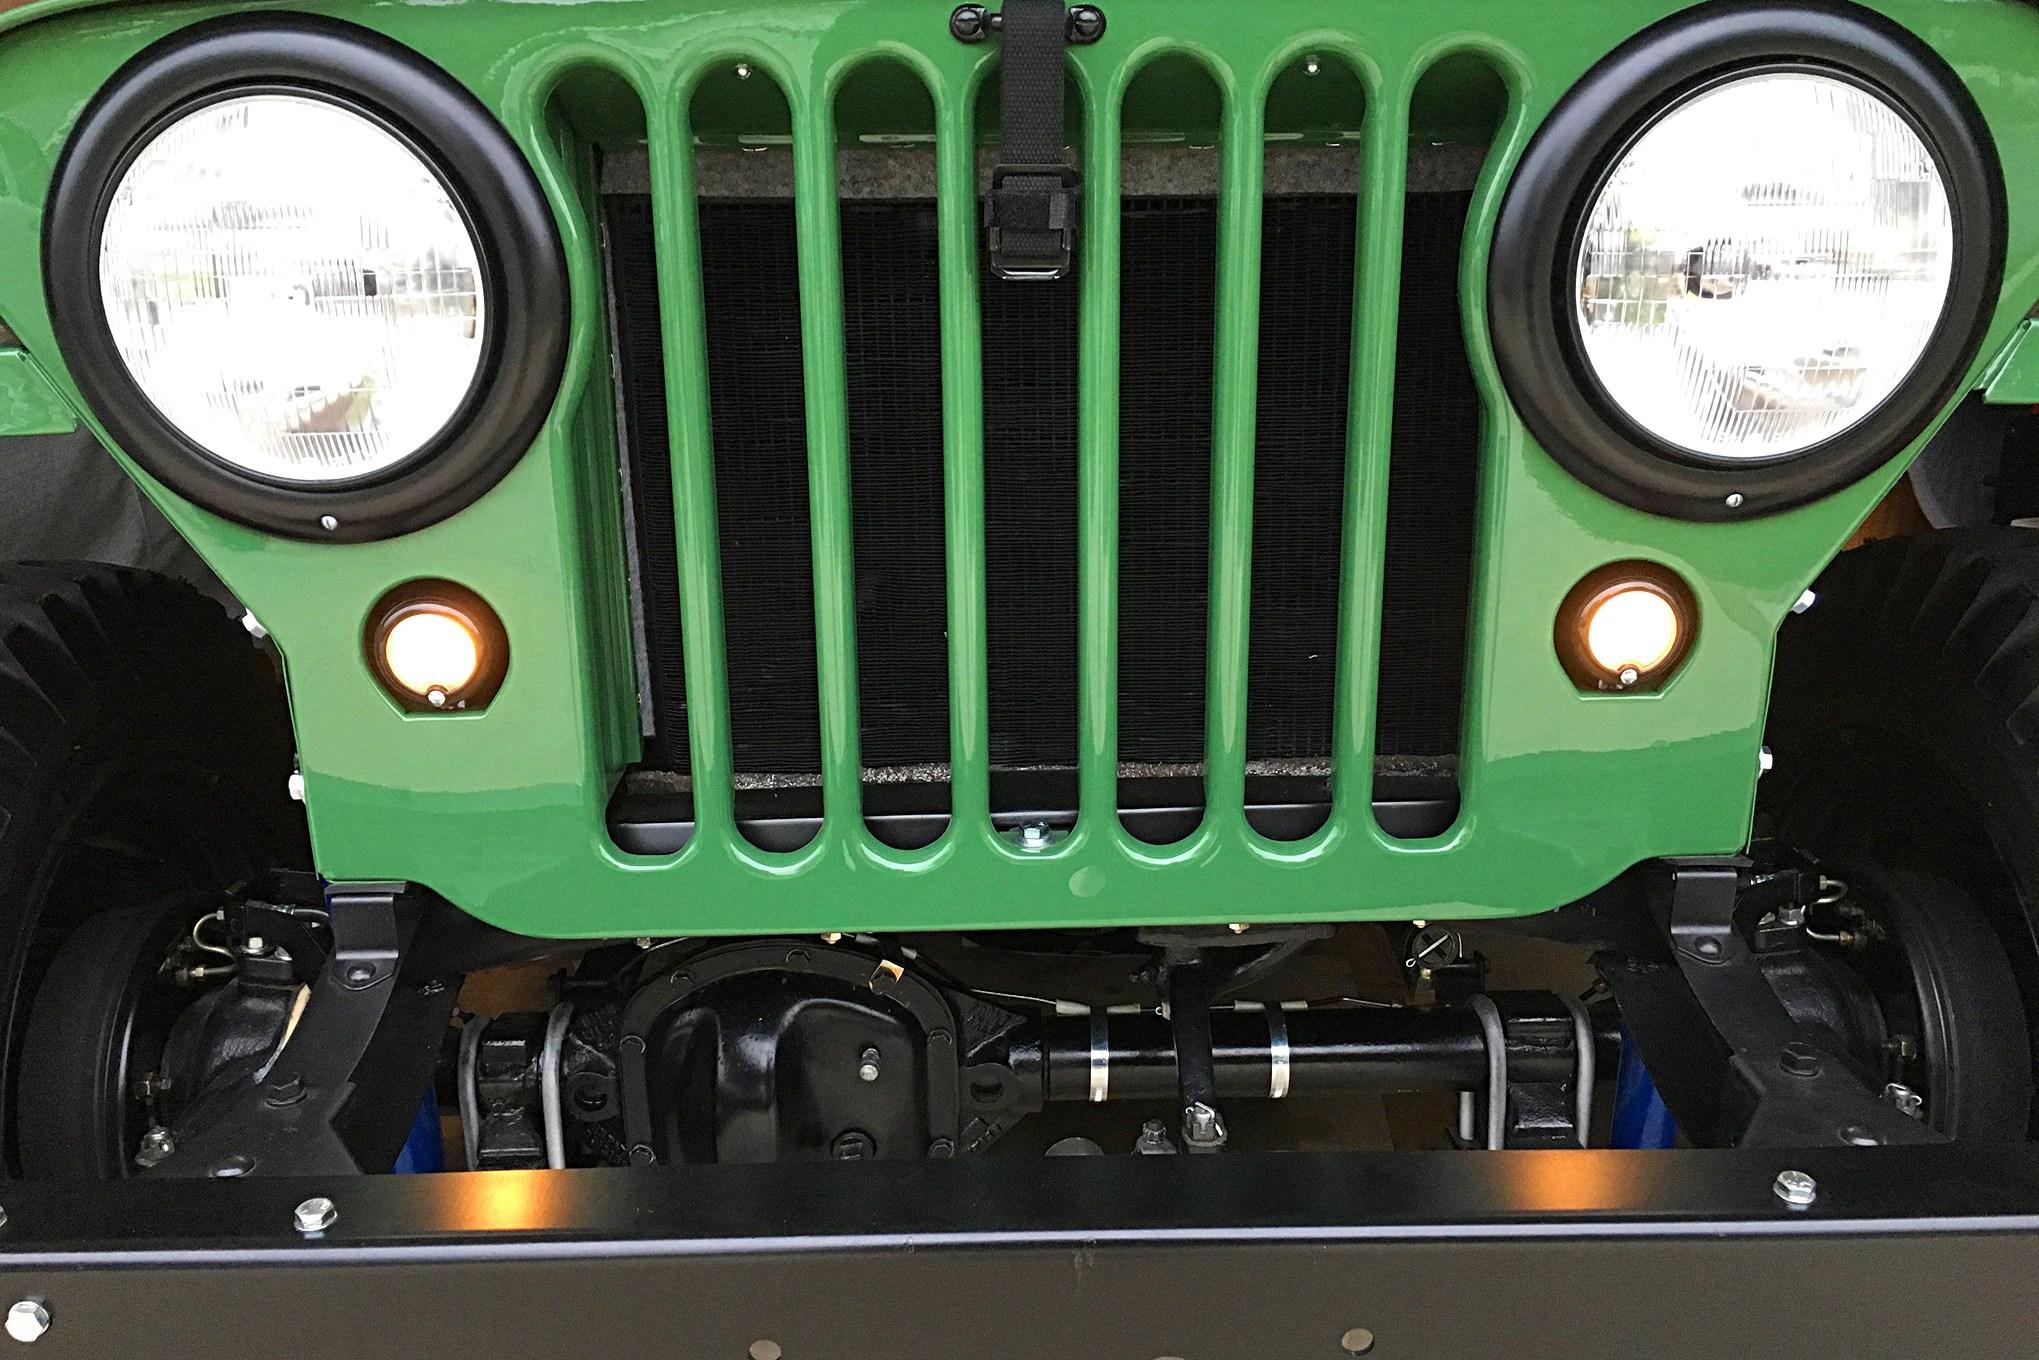 1946 jeep cj 2a rewiring made easyearly cj5 jeep wiring diagram 13 [ 2039 x 1360 Pixel ]